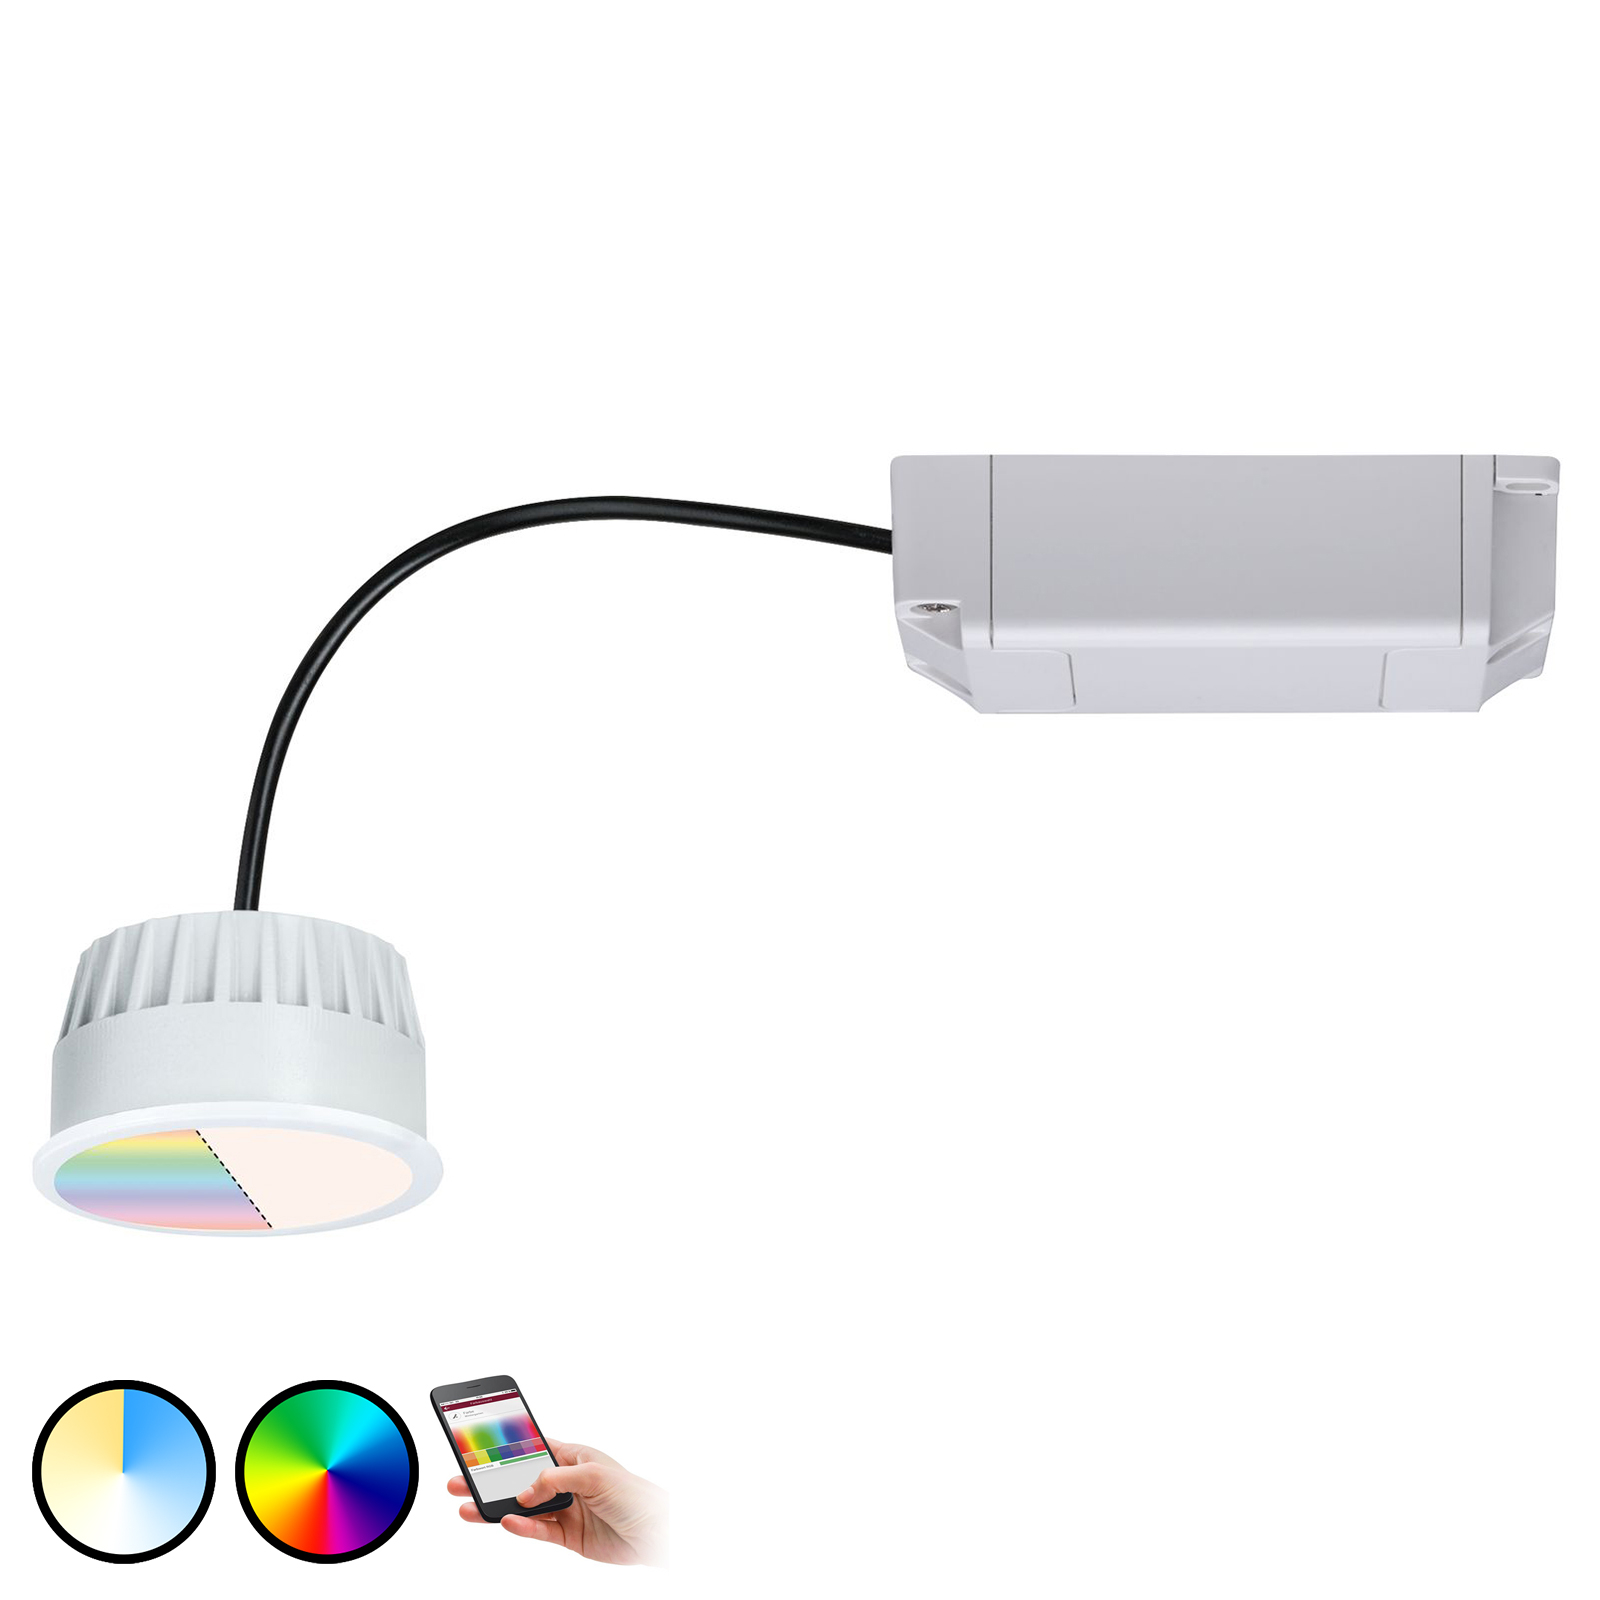 Paulmann Smart Friends ZigBee moduł LED Coin, RGBW